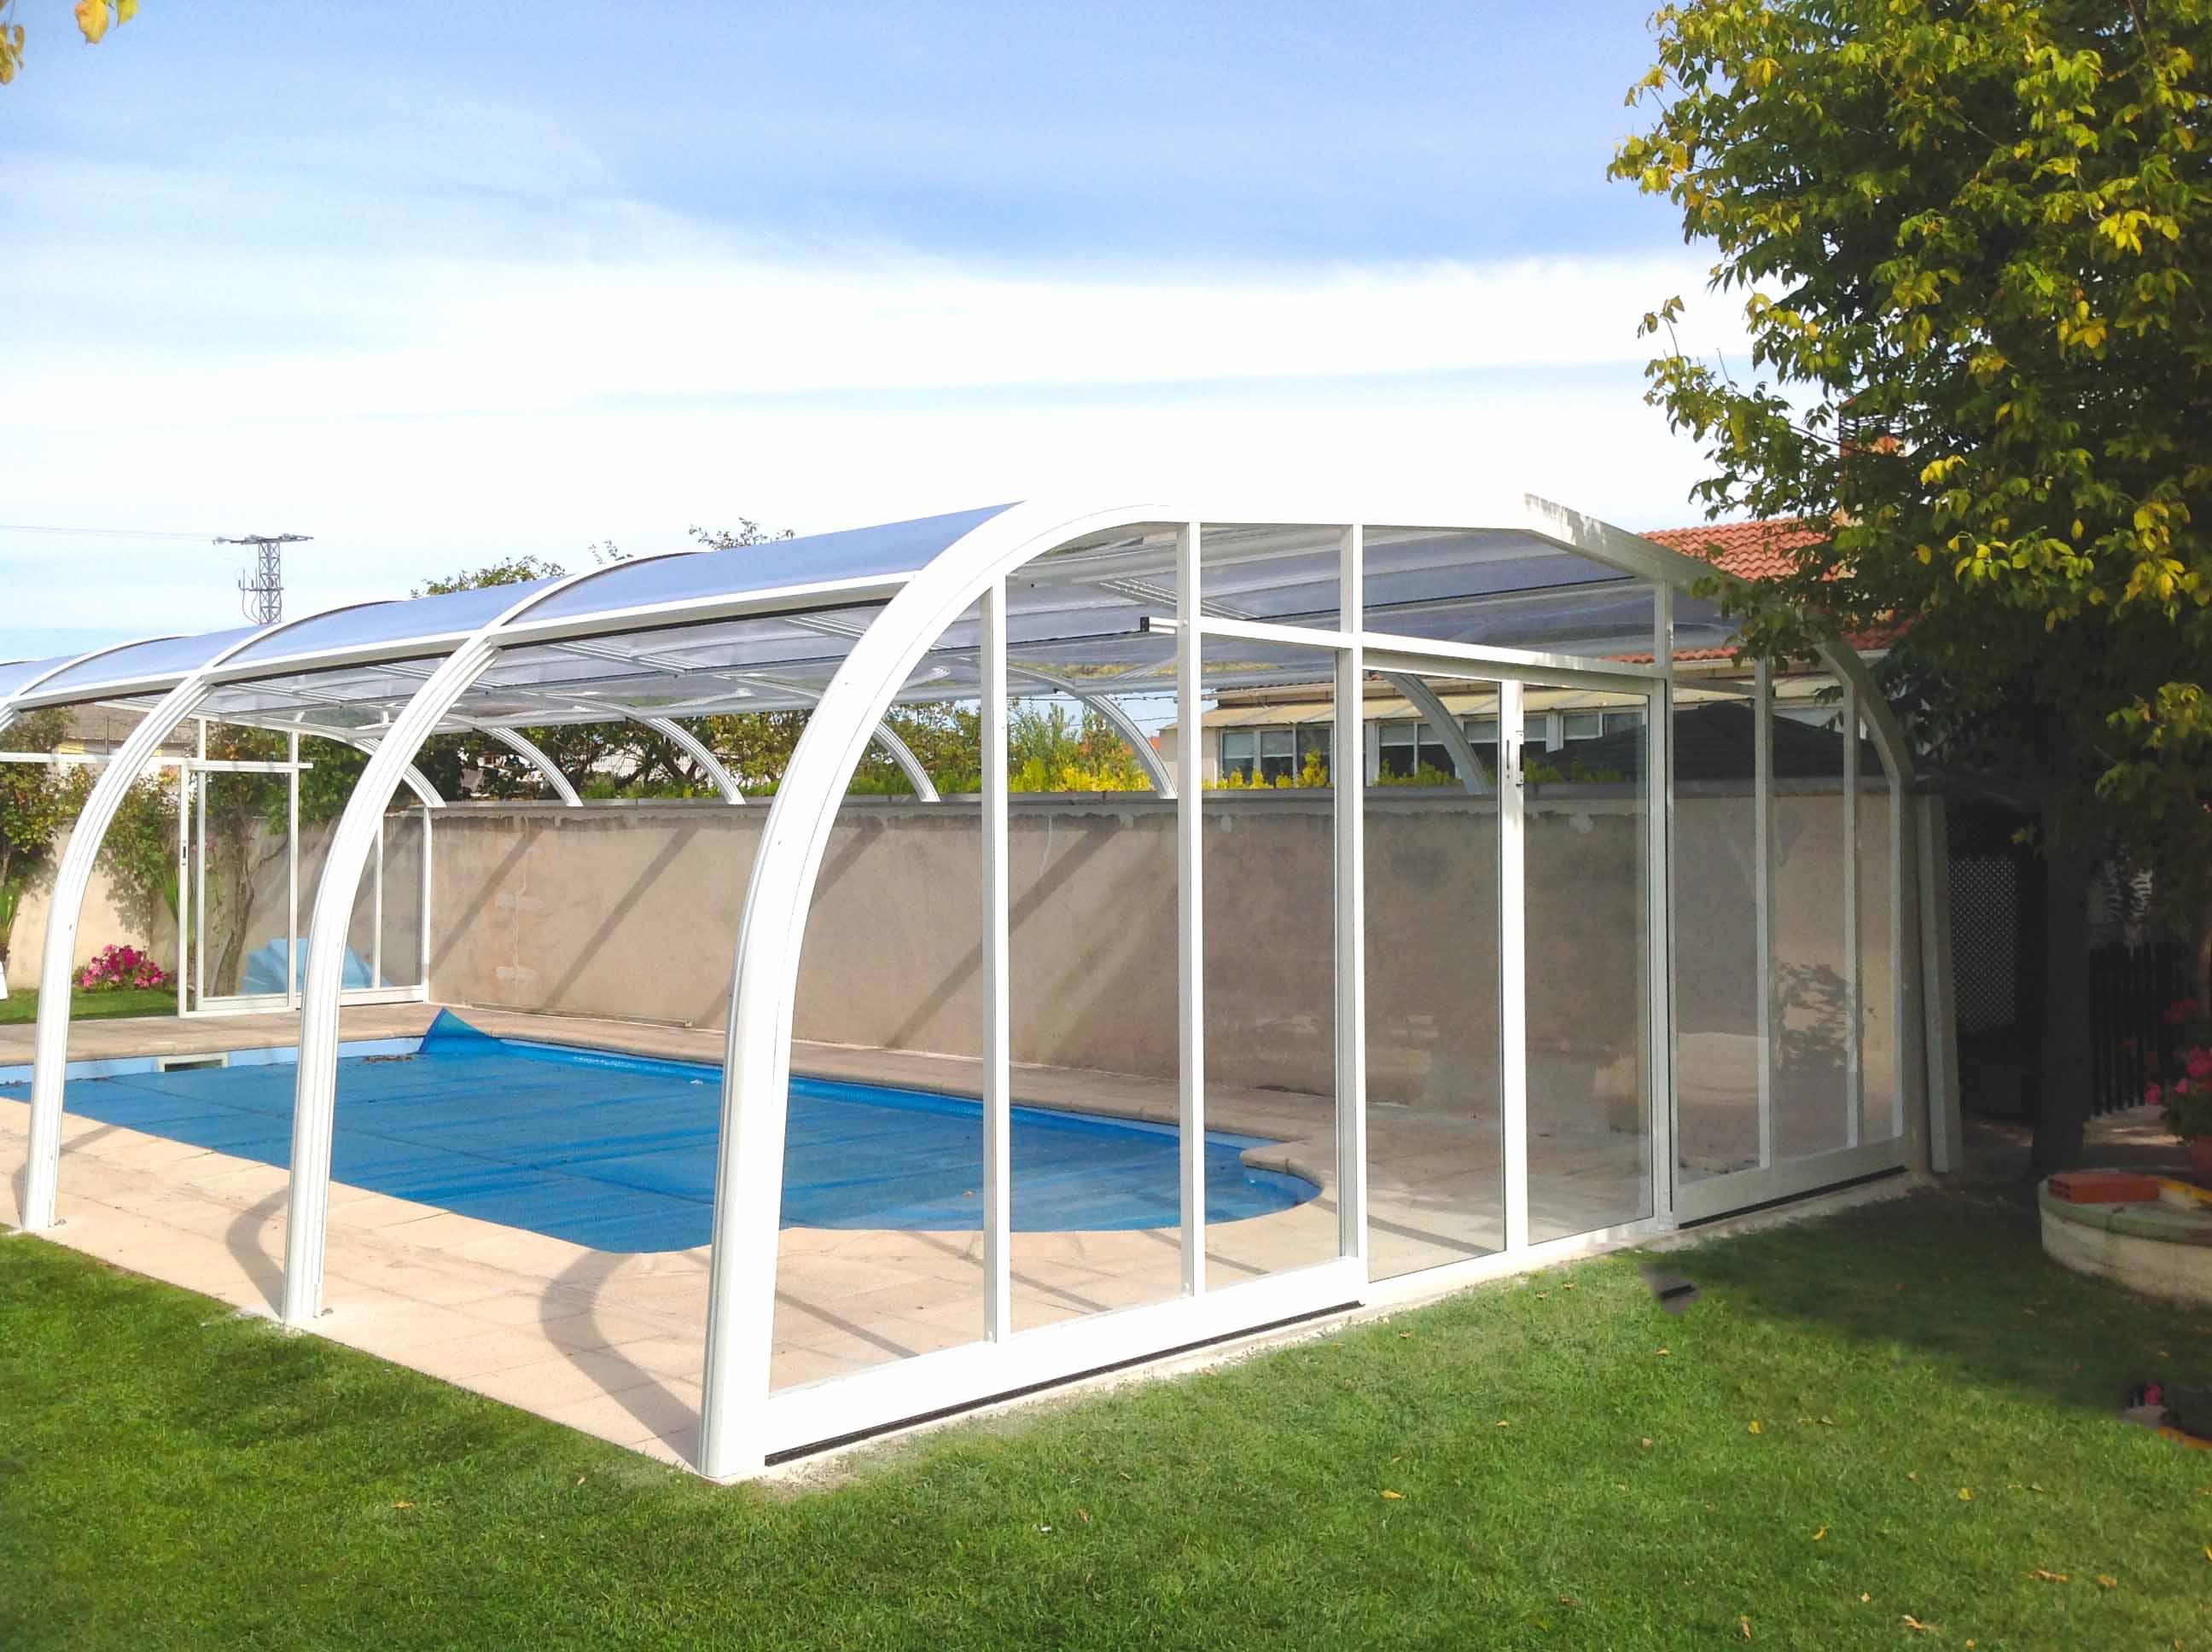 Cubiertas para piscinas precios fabrica de cubiertas para - Cubierta piscina precio ...